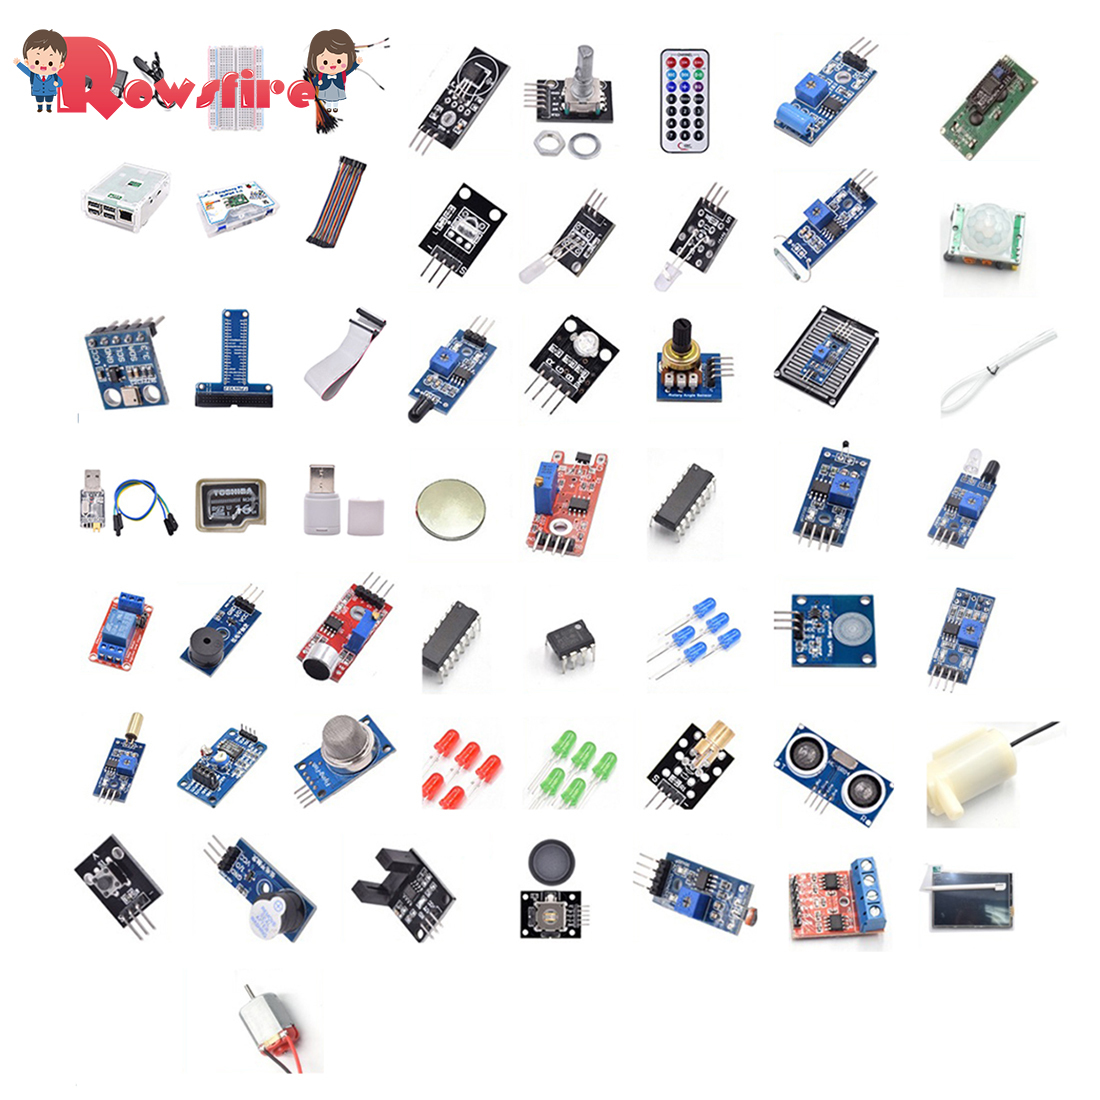 Development Board Sensor Computer Suite Deluxe Version Mainboard For Raspberry Pi 3B + Starter Kit